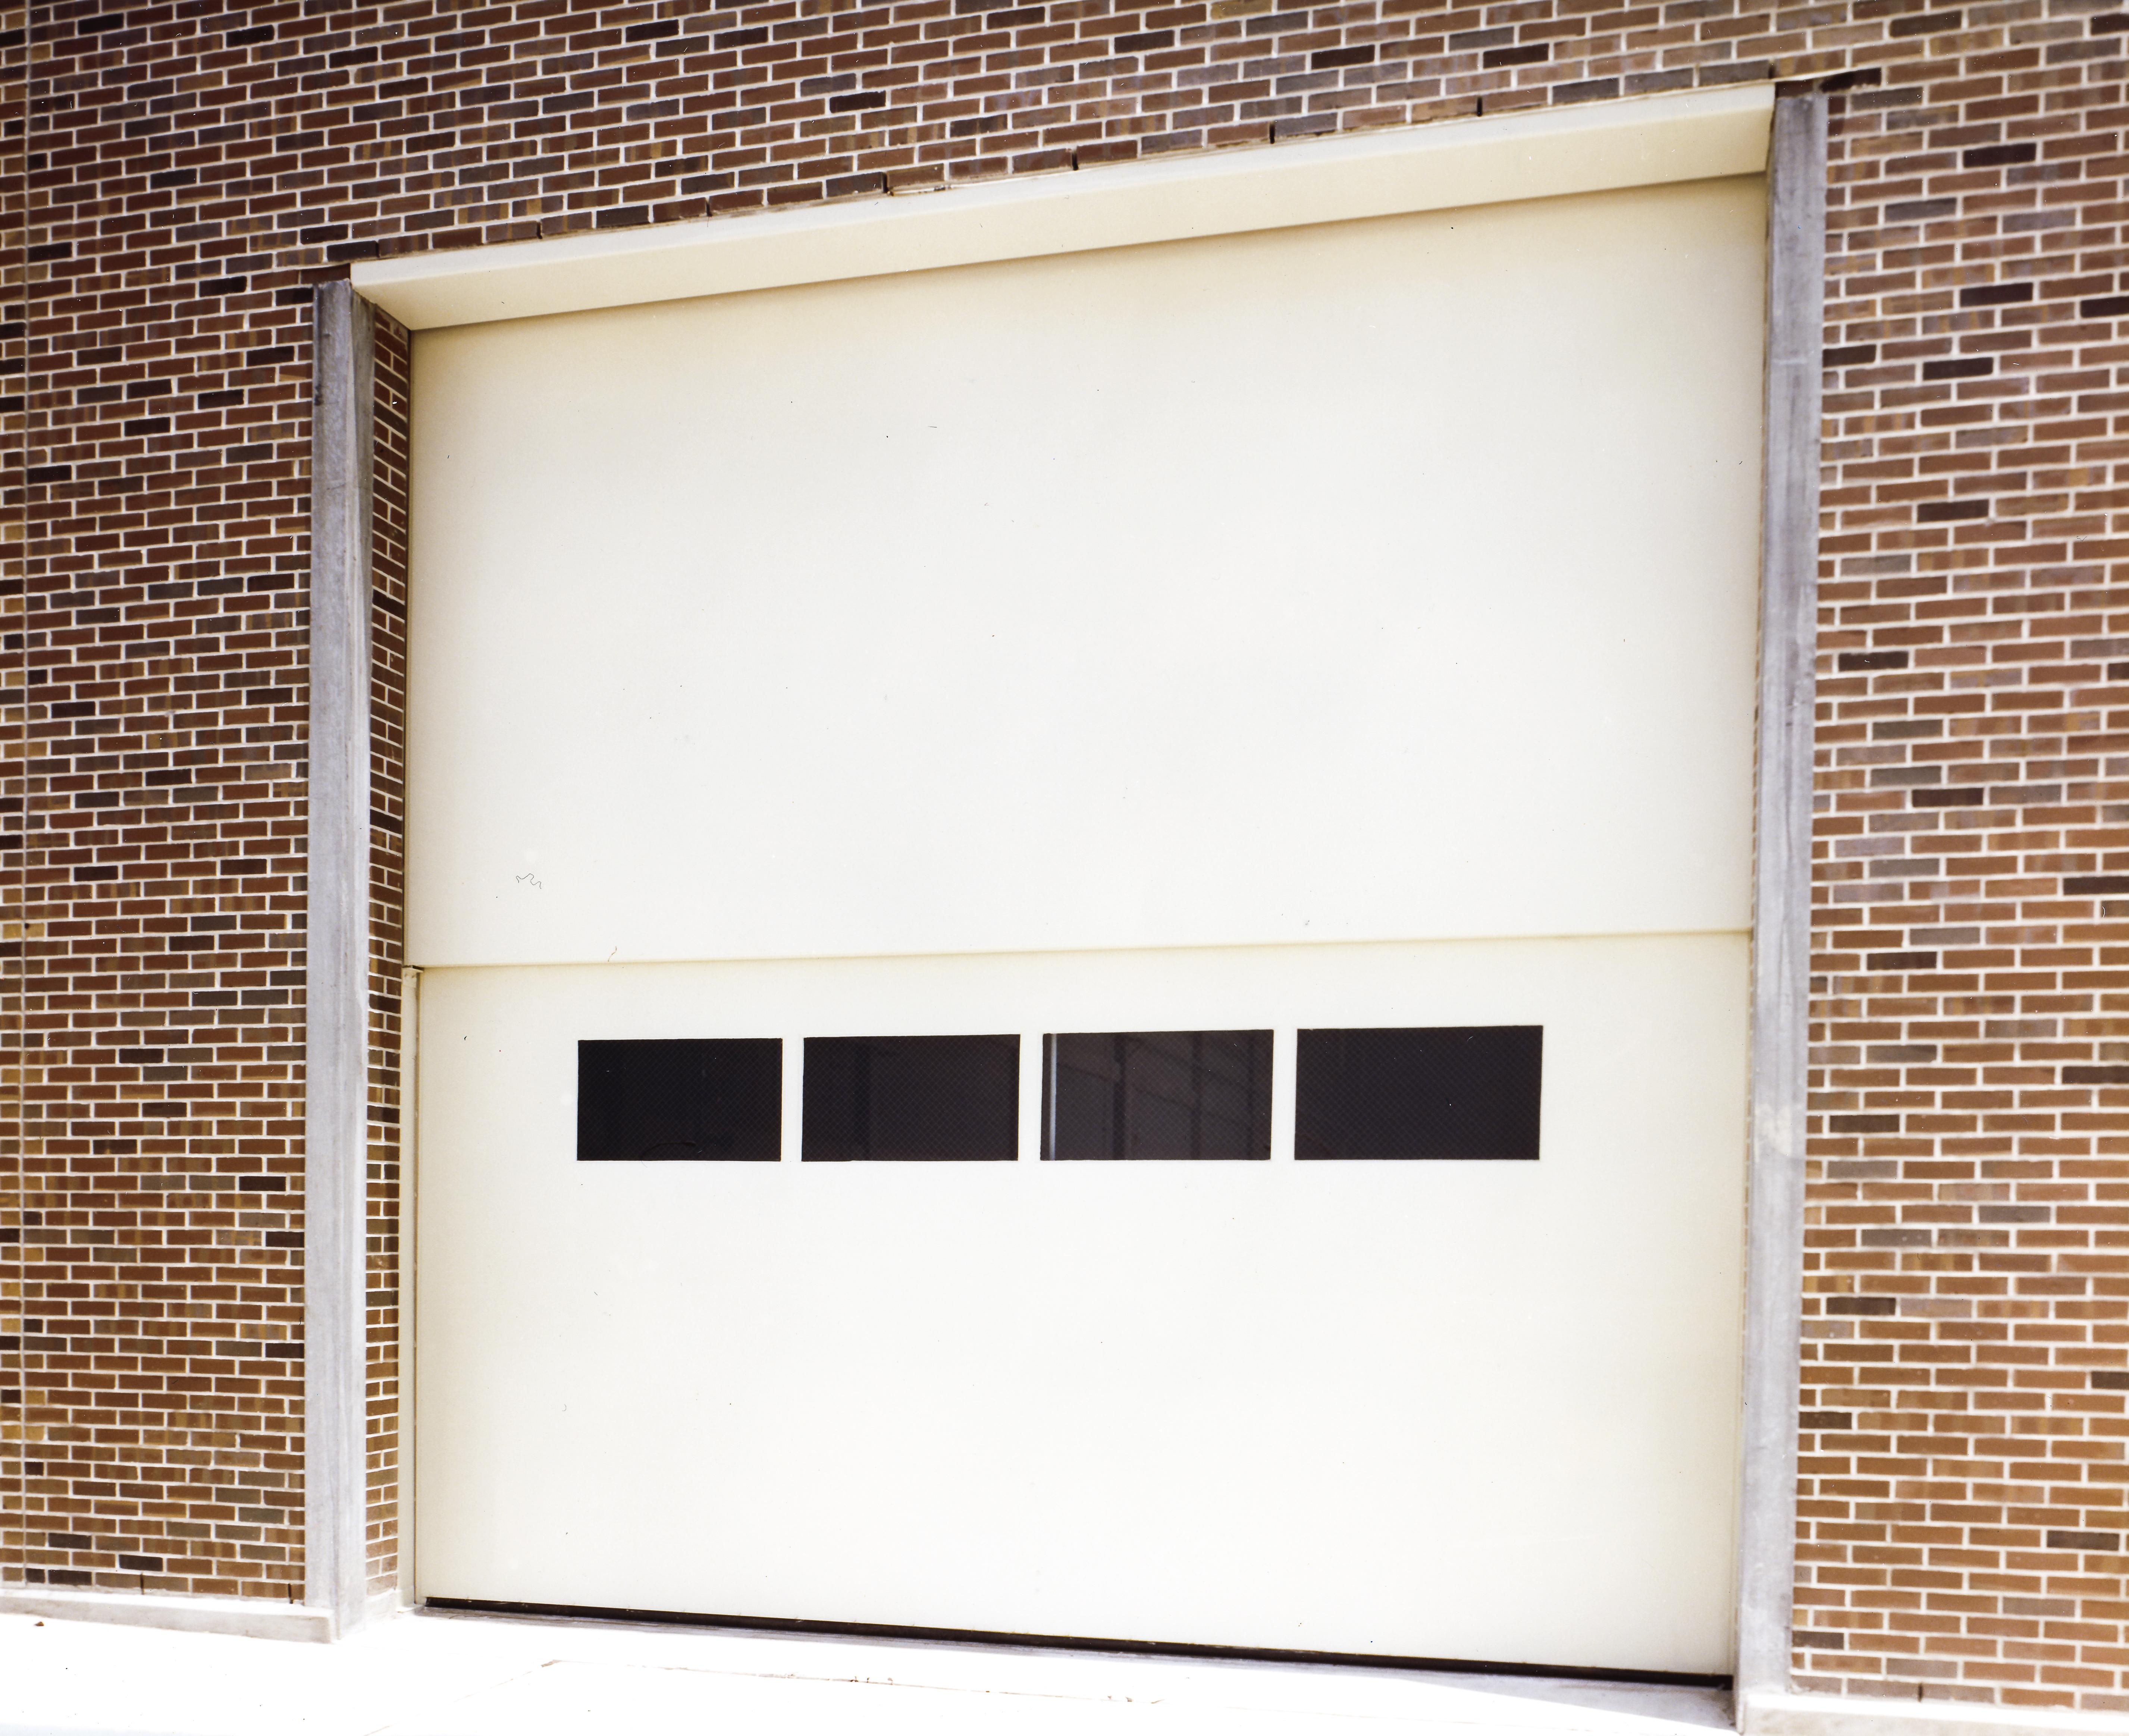 Cessna Citation Engine Rework Shops & Industrial Doors - Fleming Steel CompanyFleming Steel Company